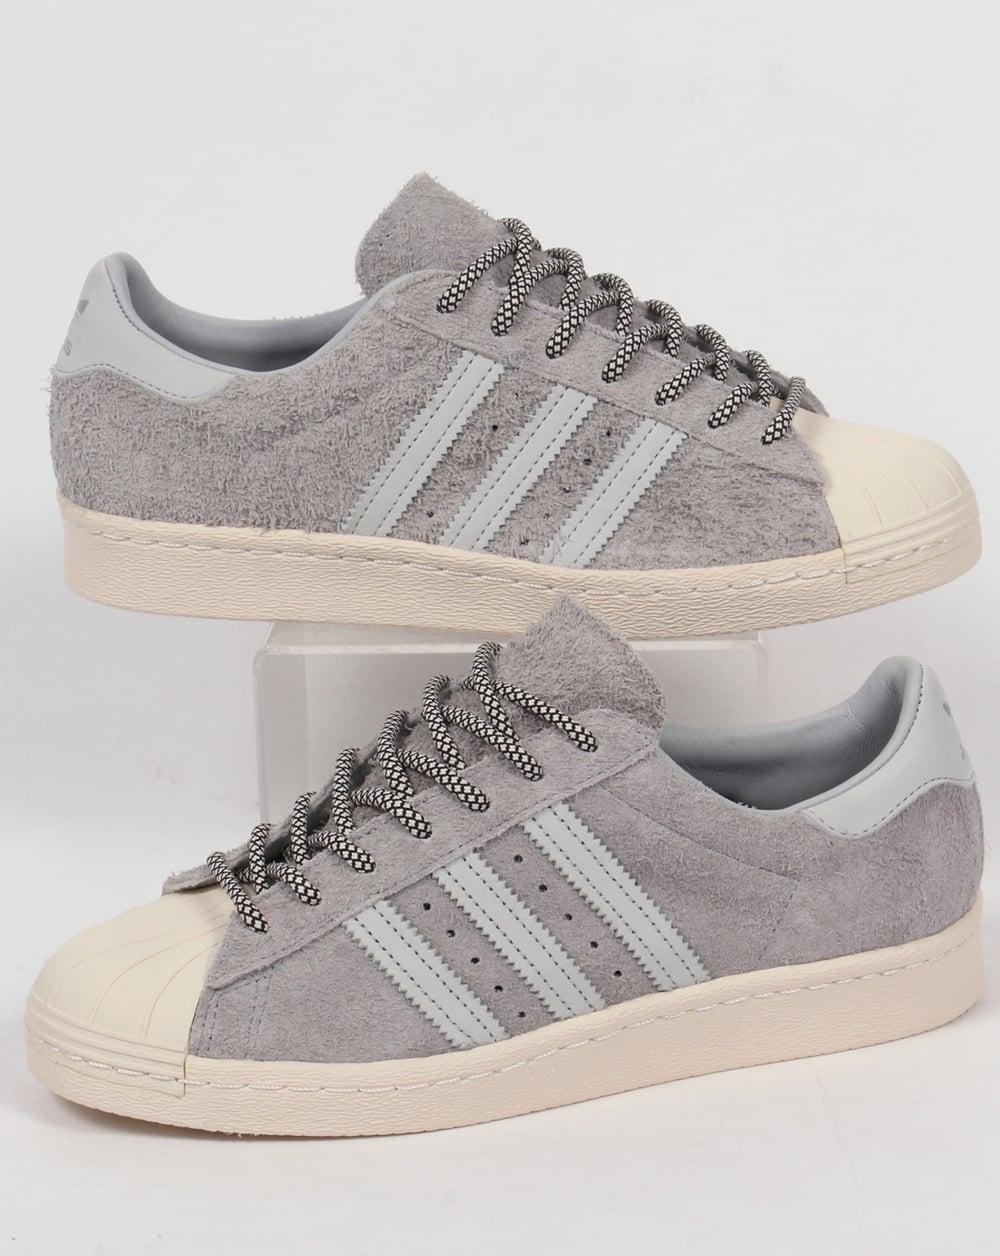 Adidas Superstar 80S Trainers Clear Grey/Light Onix U12w1641